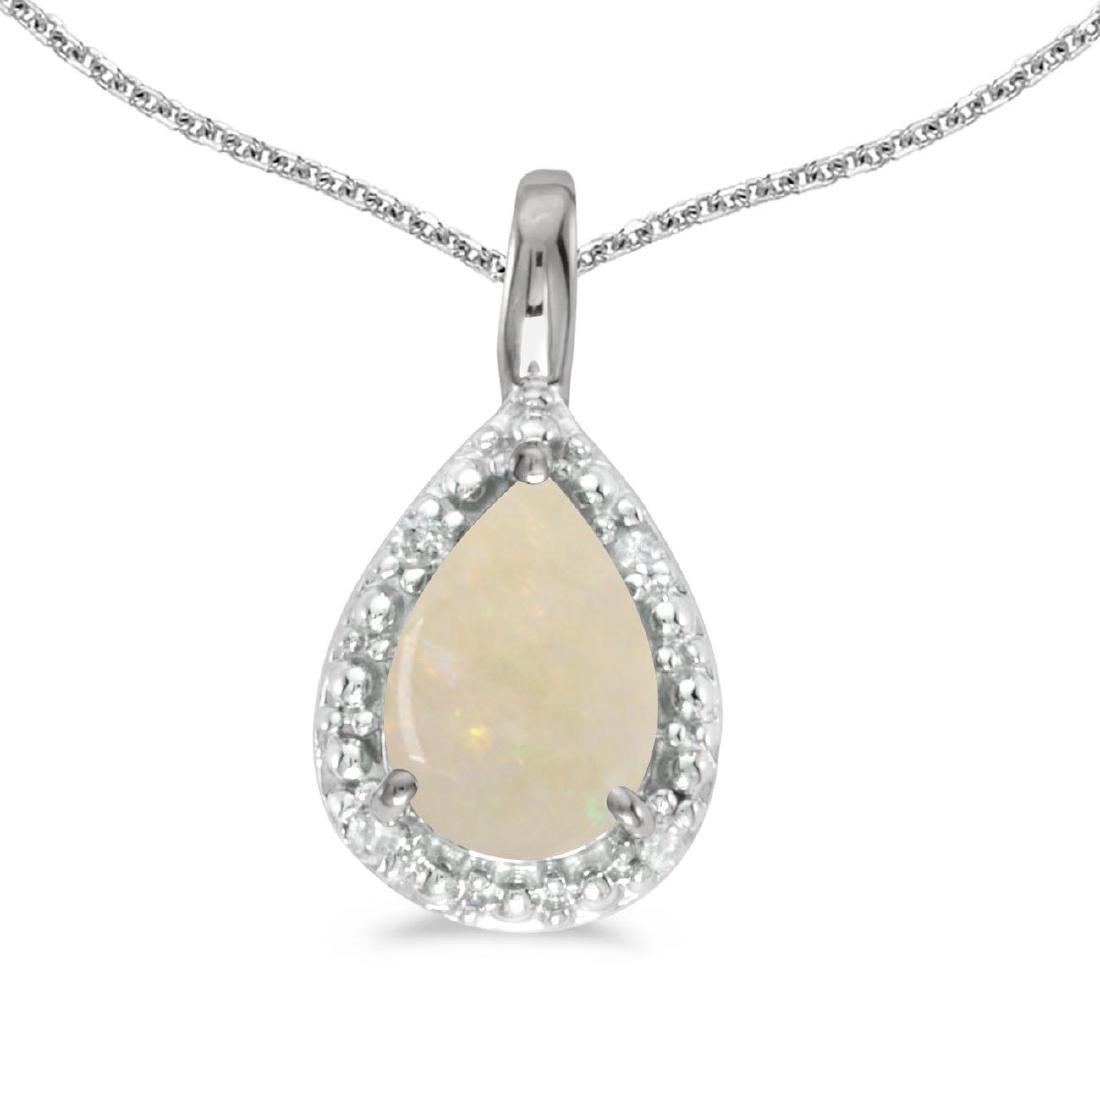 Certified 14k White Gold Pear Opal Pendant 0.23 CTW